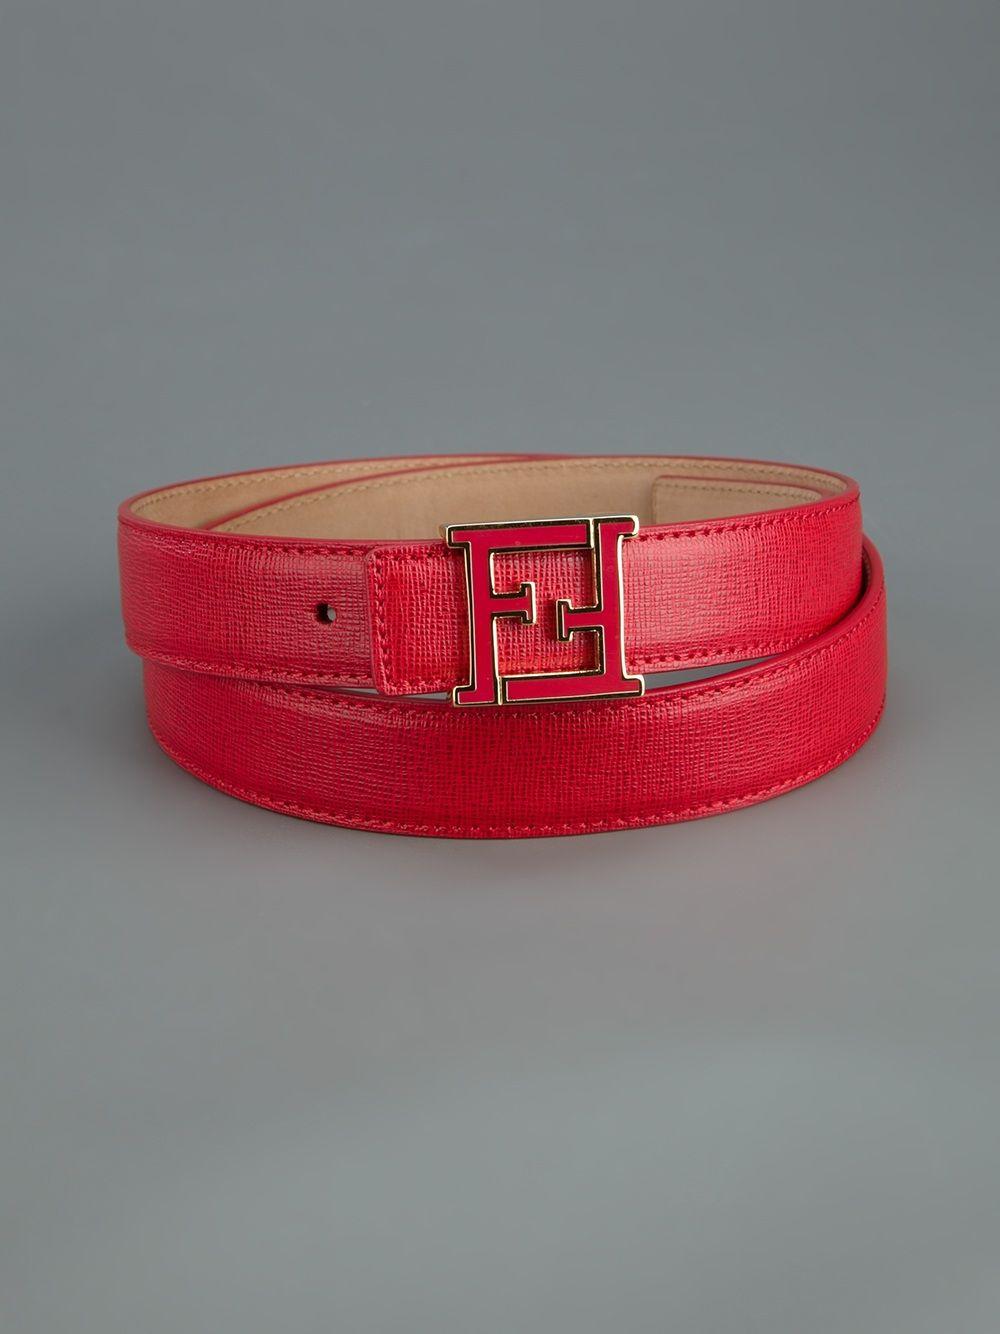 1188957ad332b Fendi Belt - Parisi - farfetch.com   Fashion   Fendi belt, Hermes ...